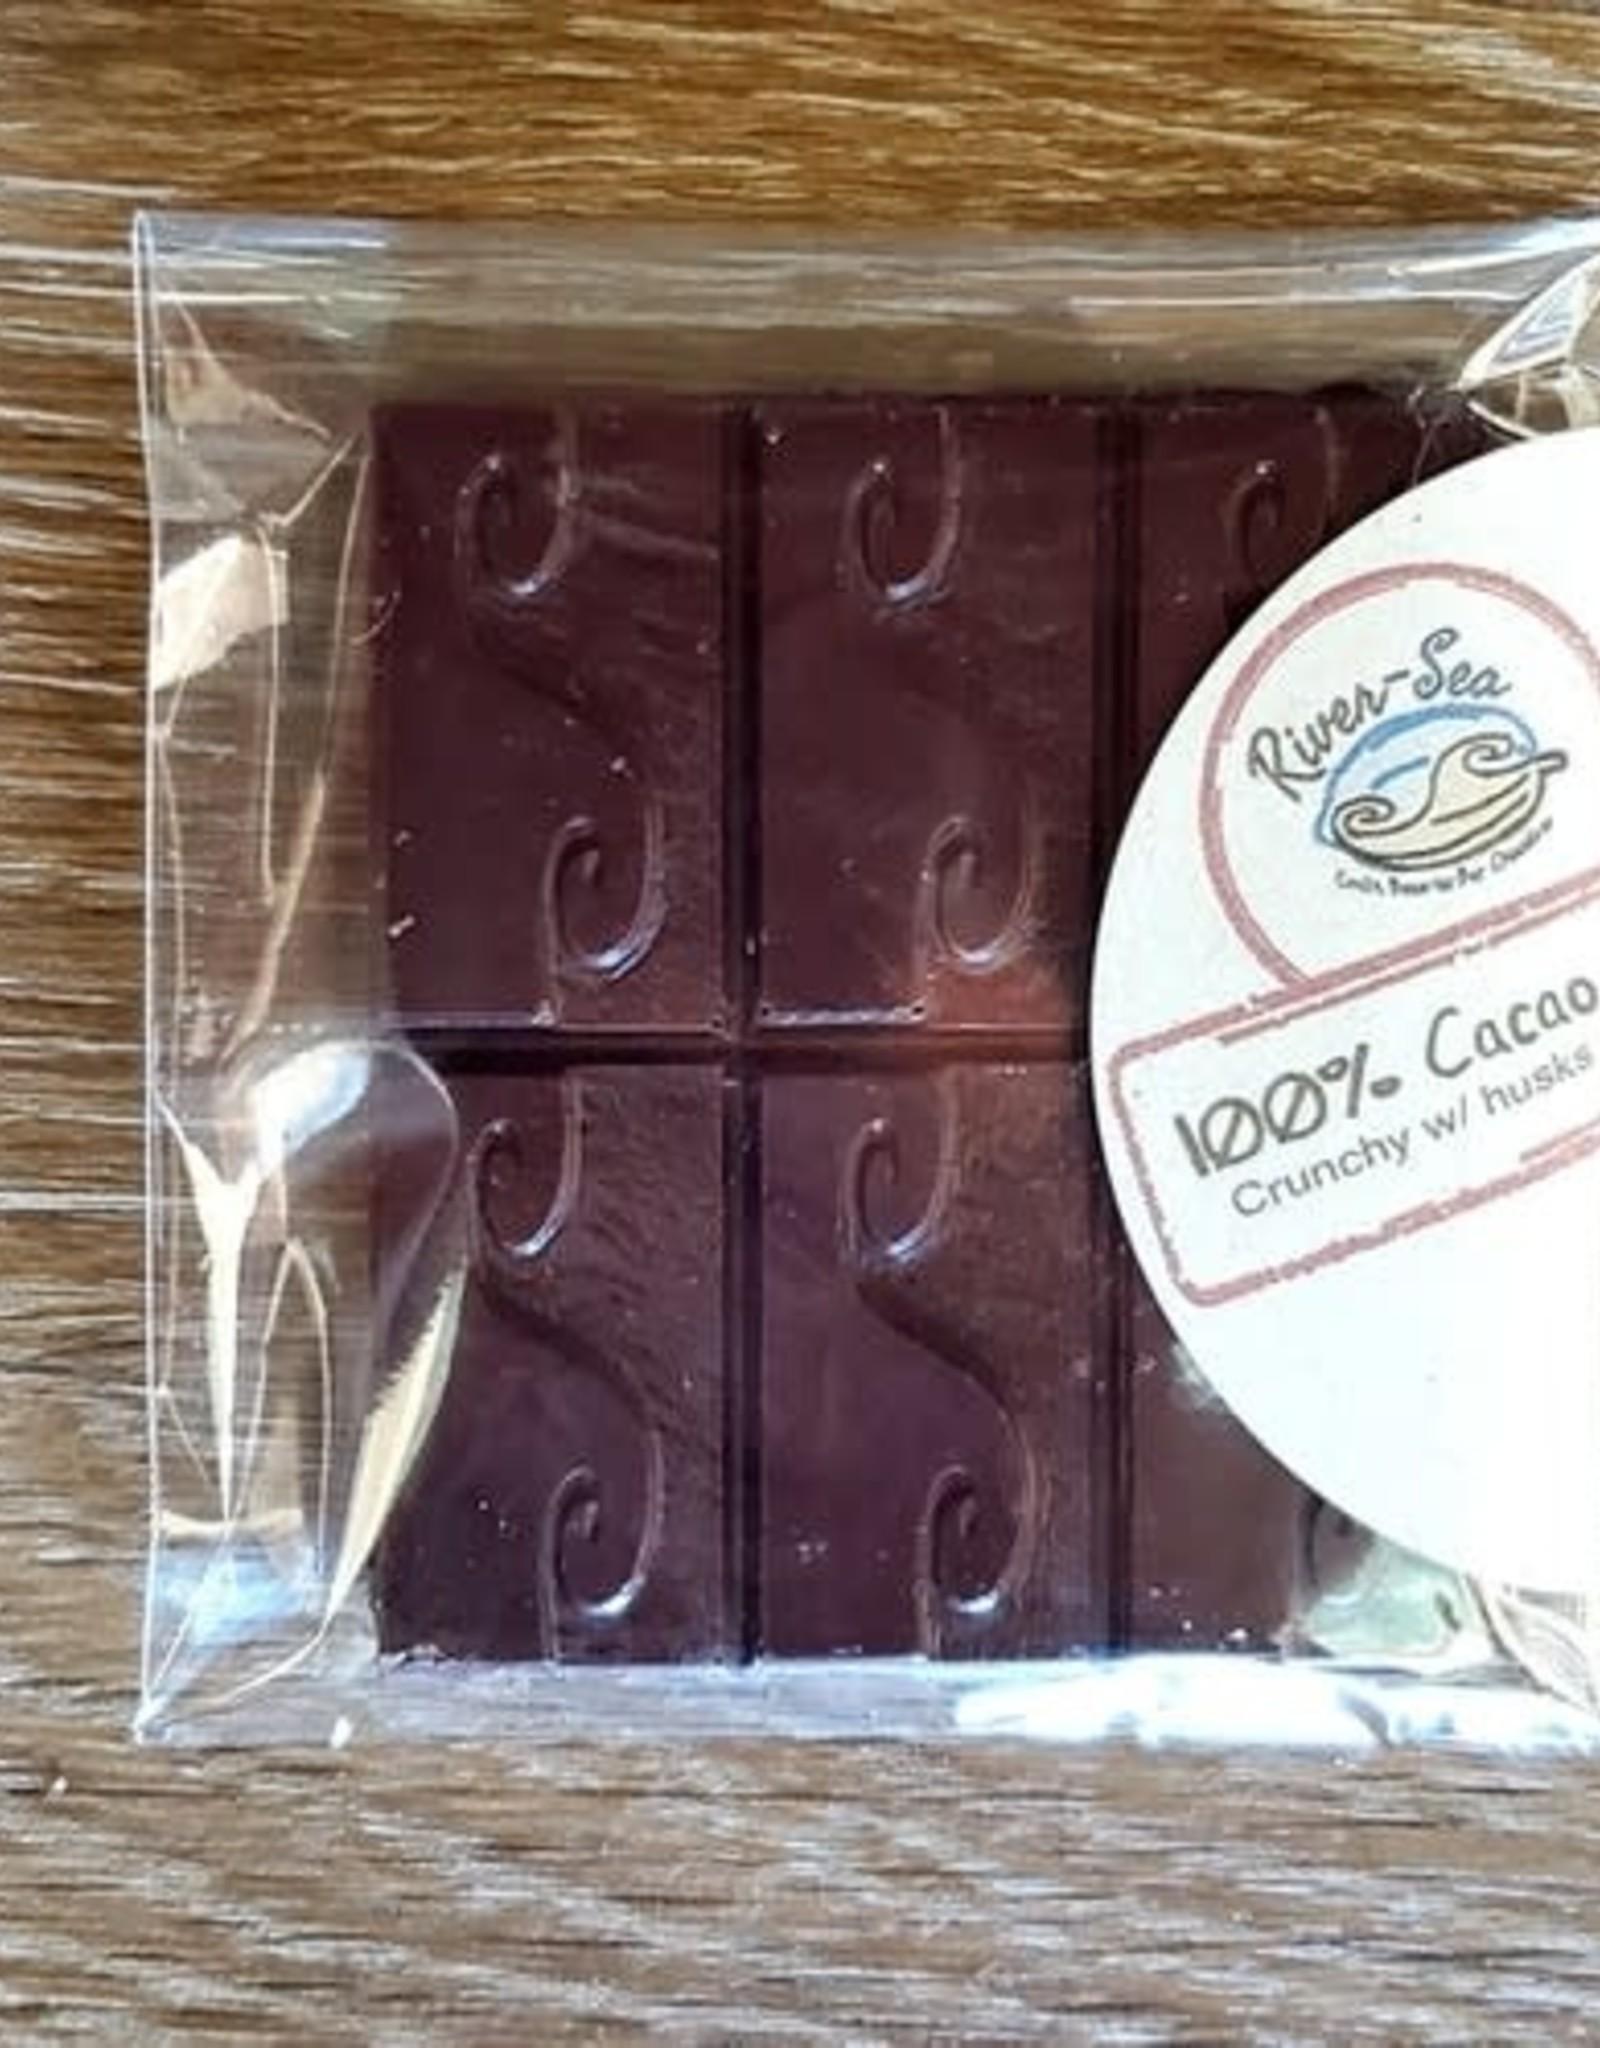 River-Sea Chocolate 100% Cocao Bar